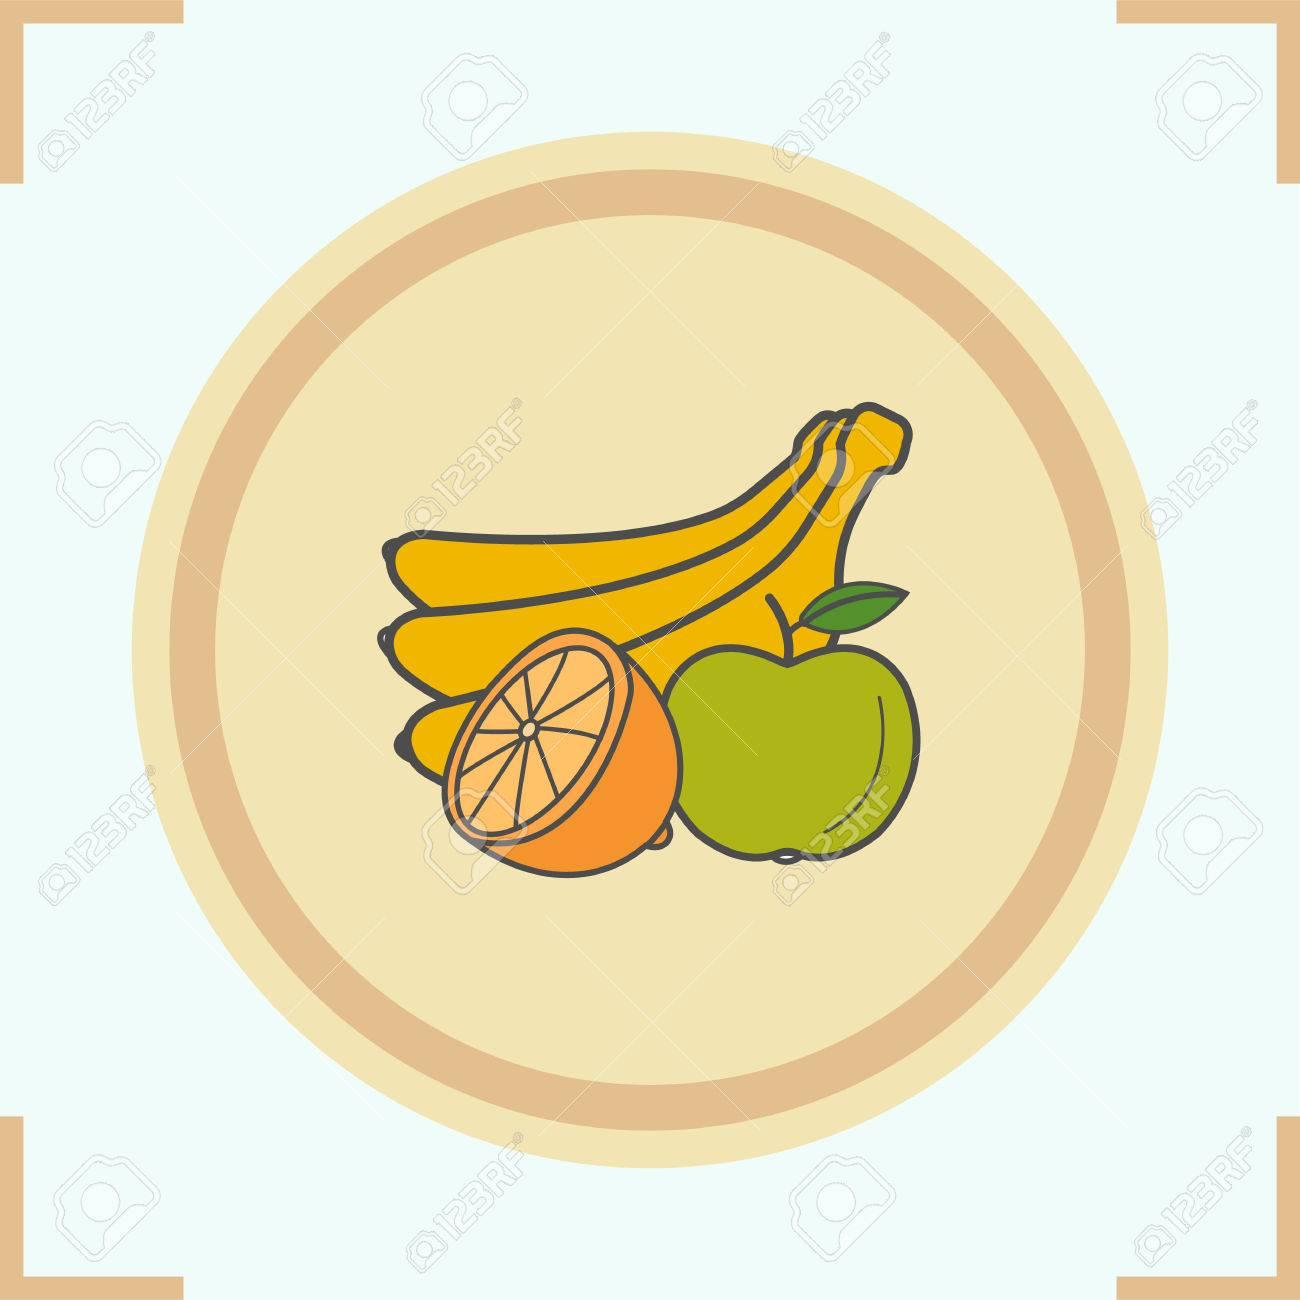 Fruchtfarbe Symbol. Bündel Bananen, Halbiert Zitrone Und Apfel ...